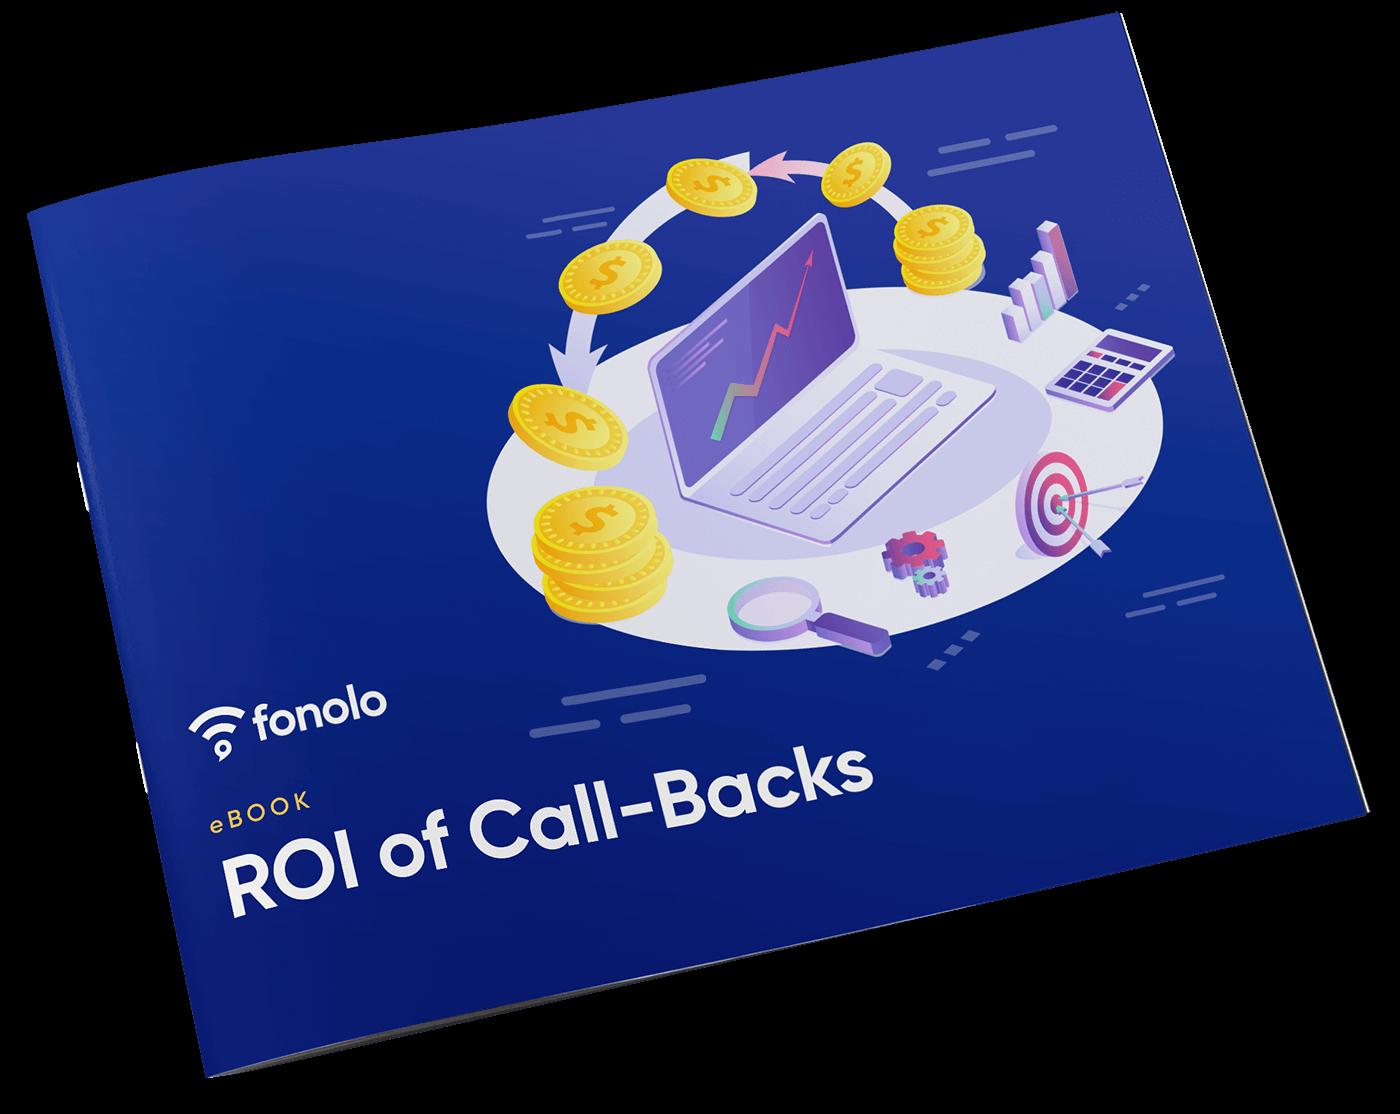 ROI of Call-Backs eBook image